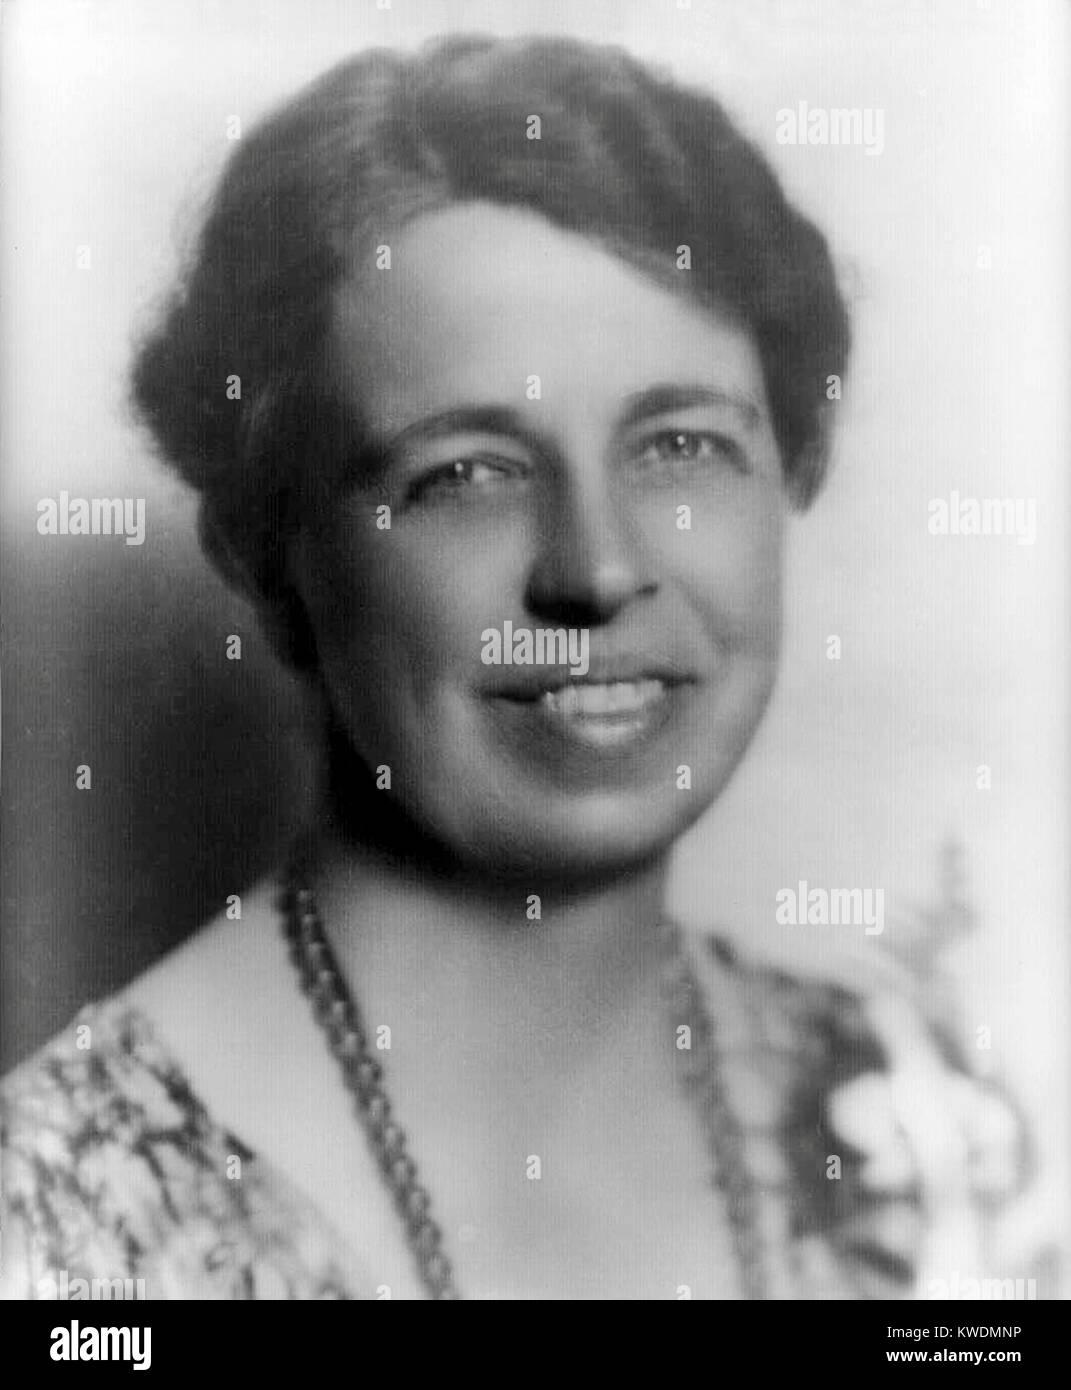 Anna Eleanor Roosevelt Imágenes De Stock & Anna Eleanor Roosevelt ...